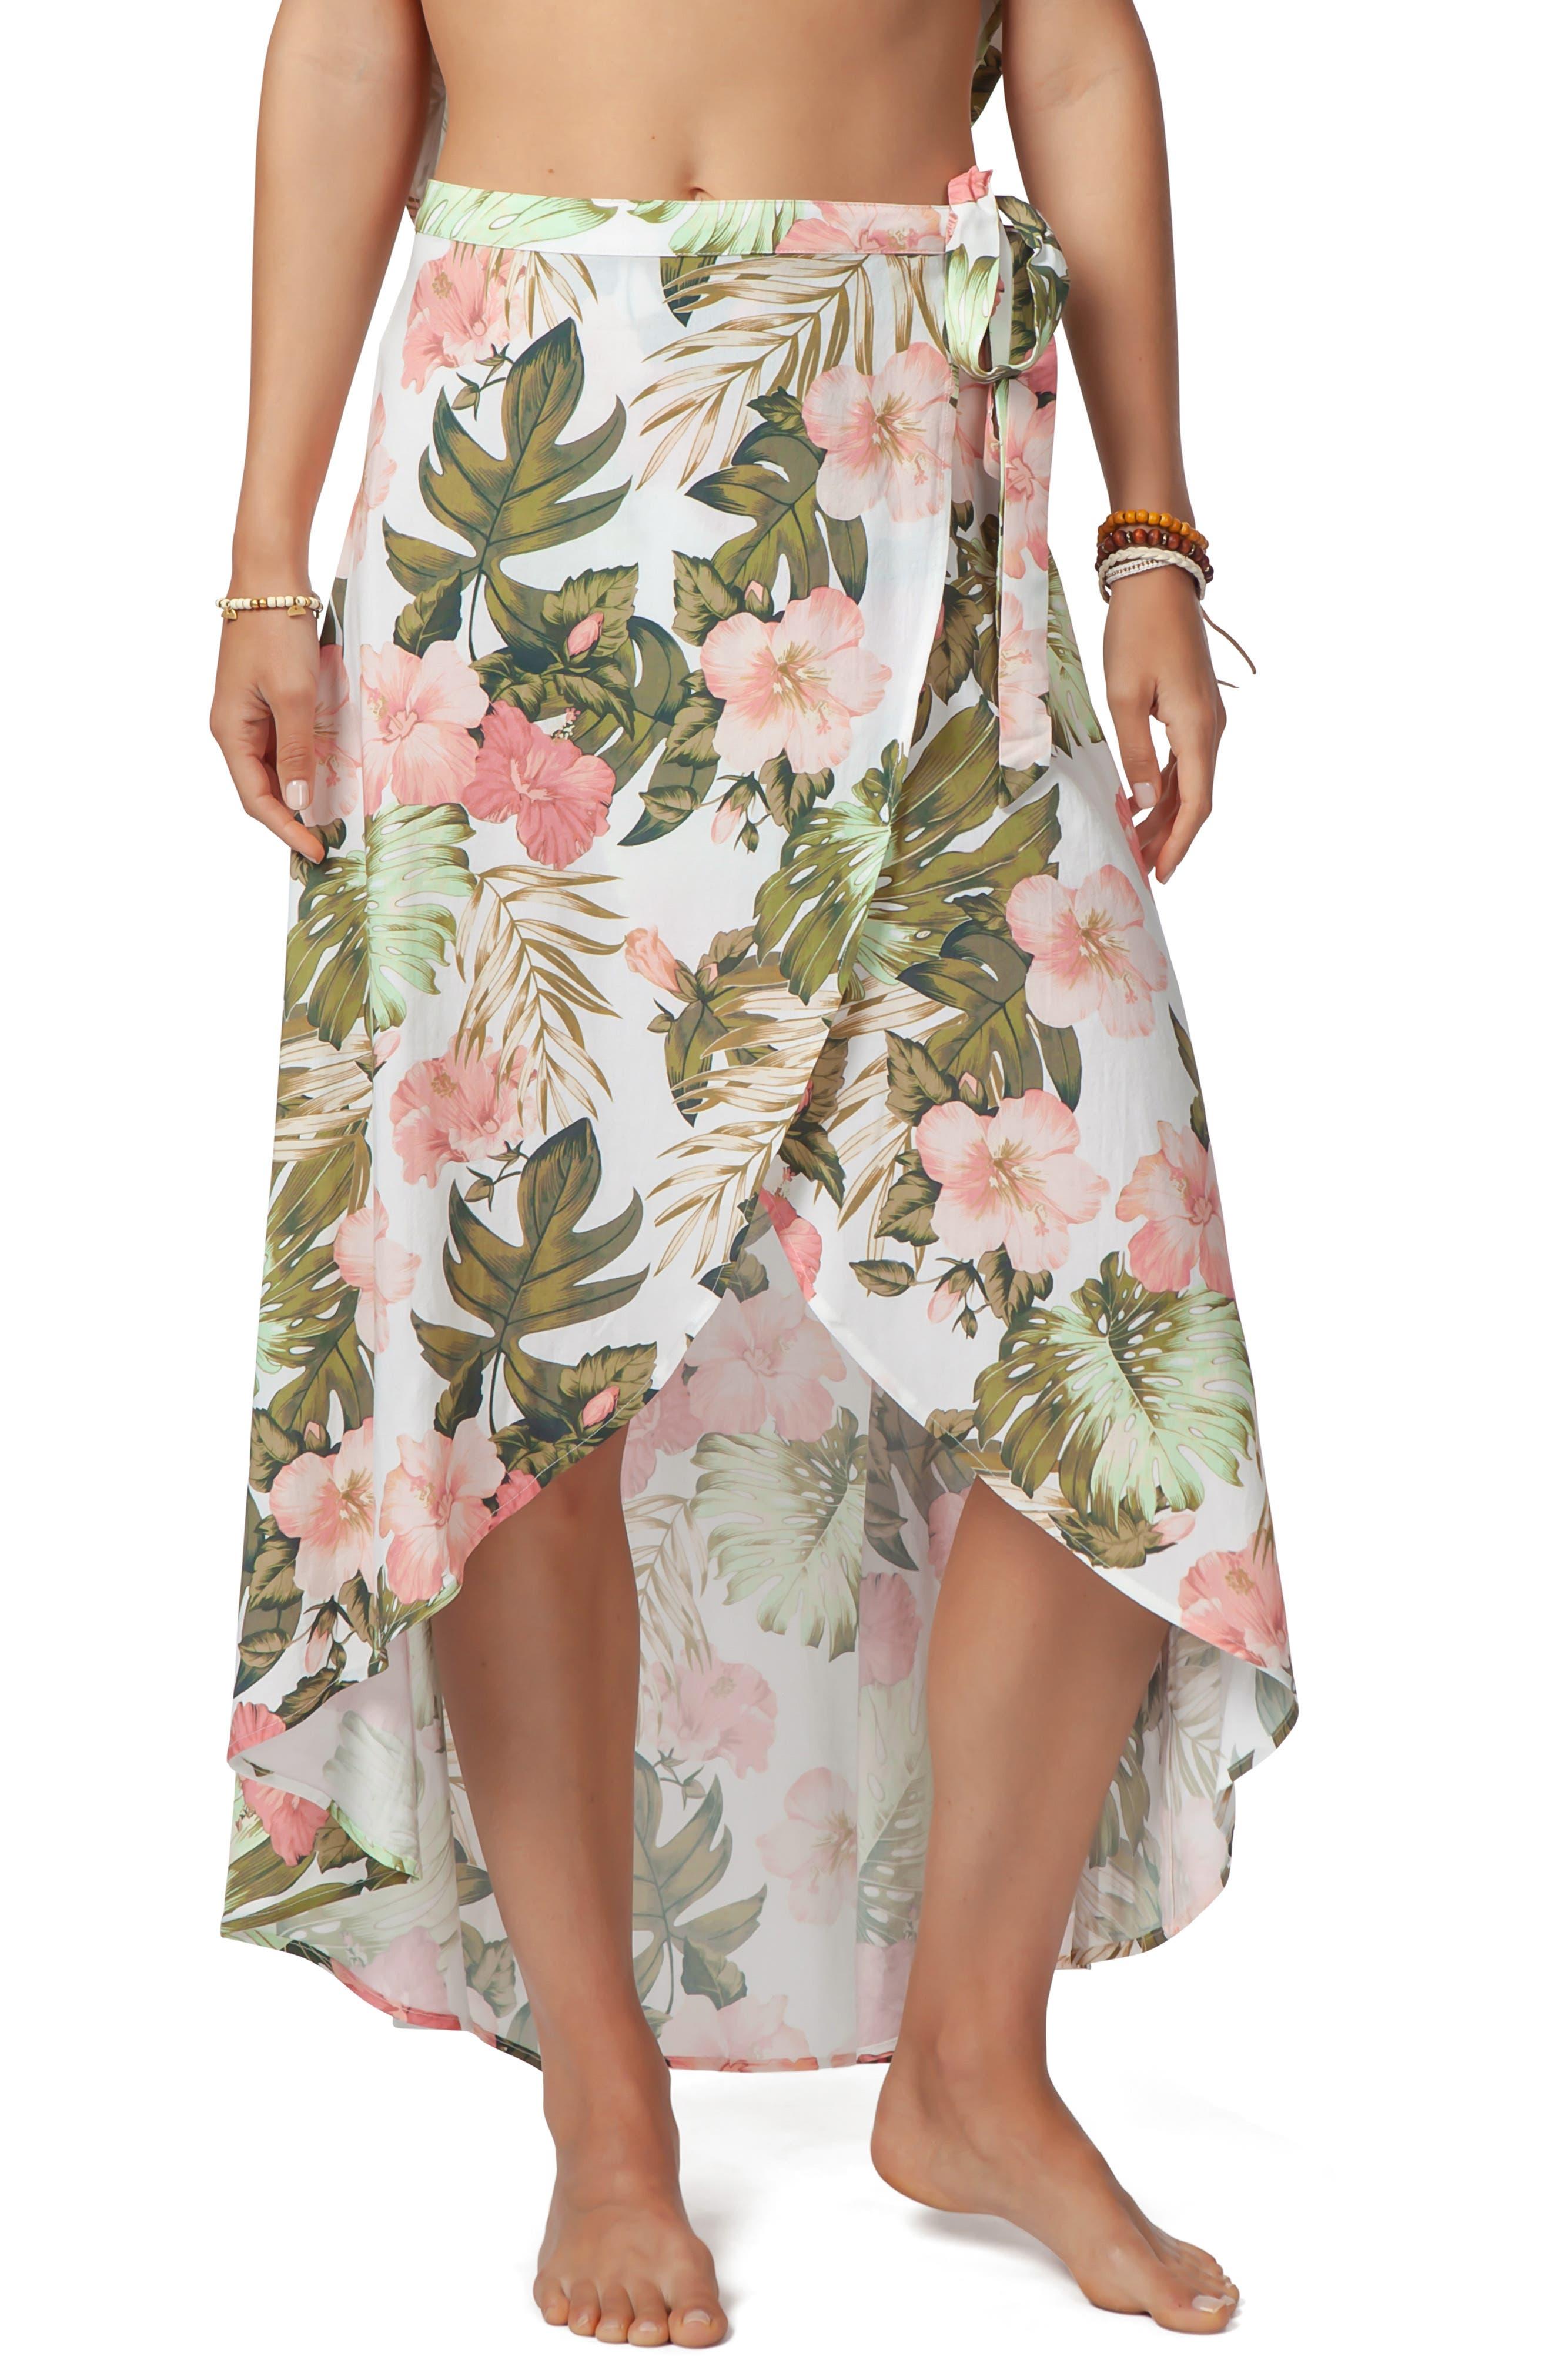 RIP CURL, Hanalei Bay Wrap Skirt, Main thumbnail 1, color, 100